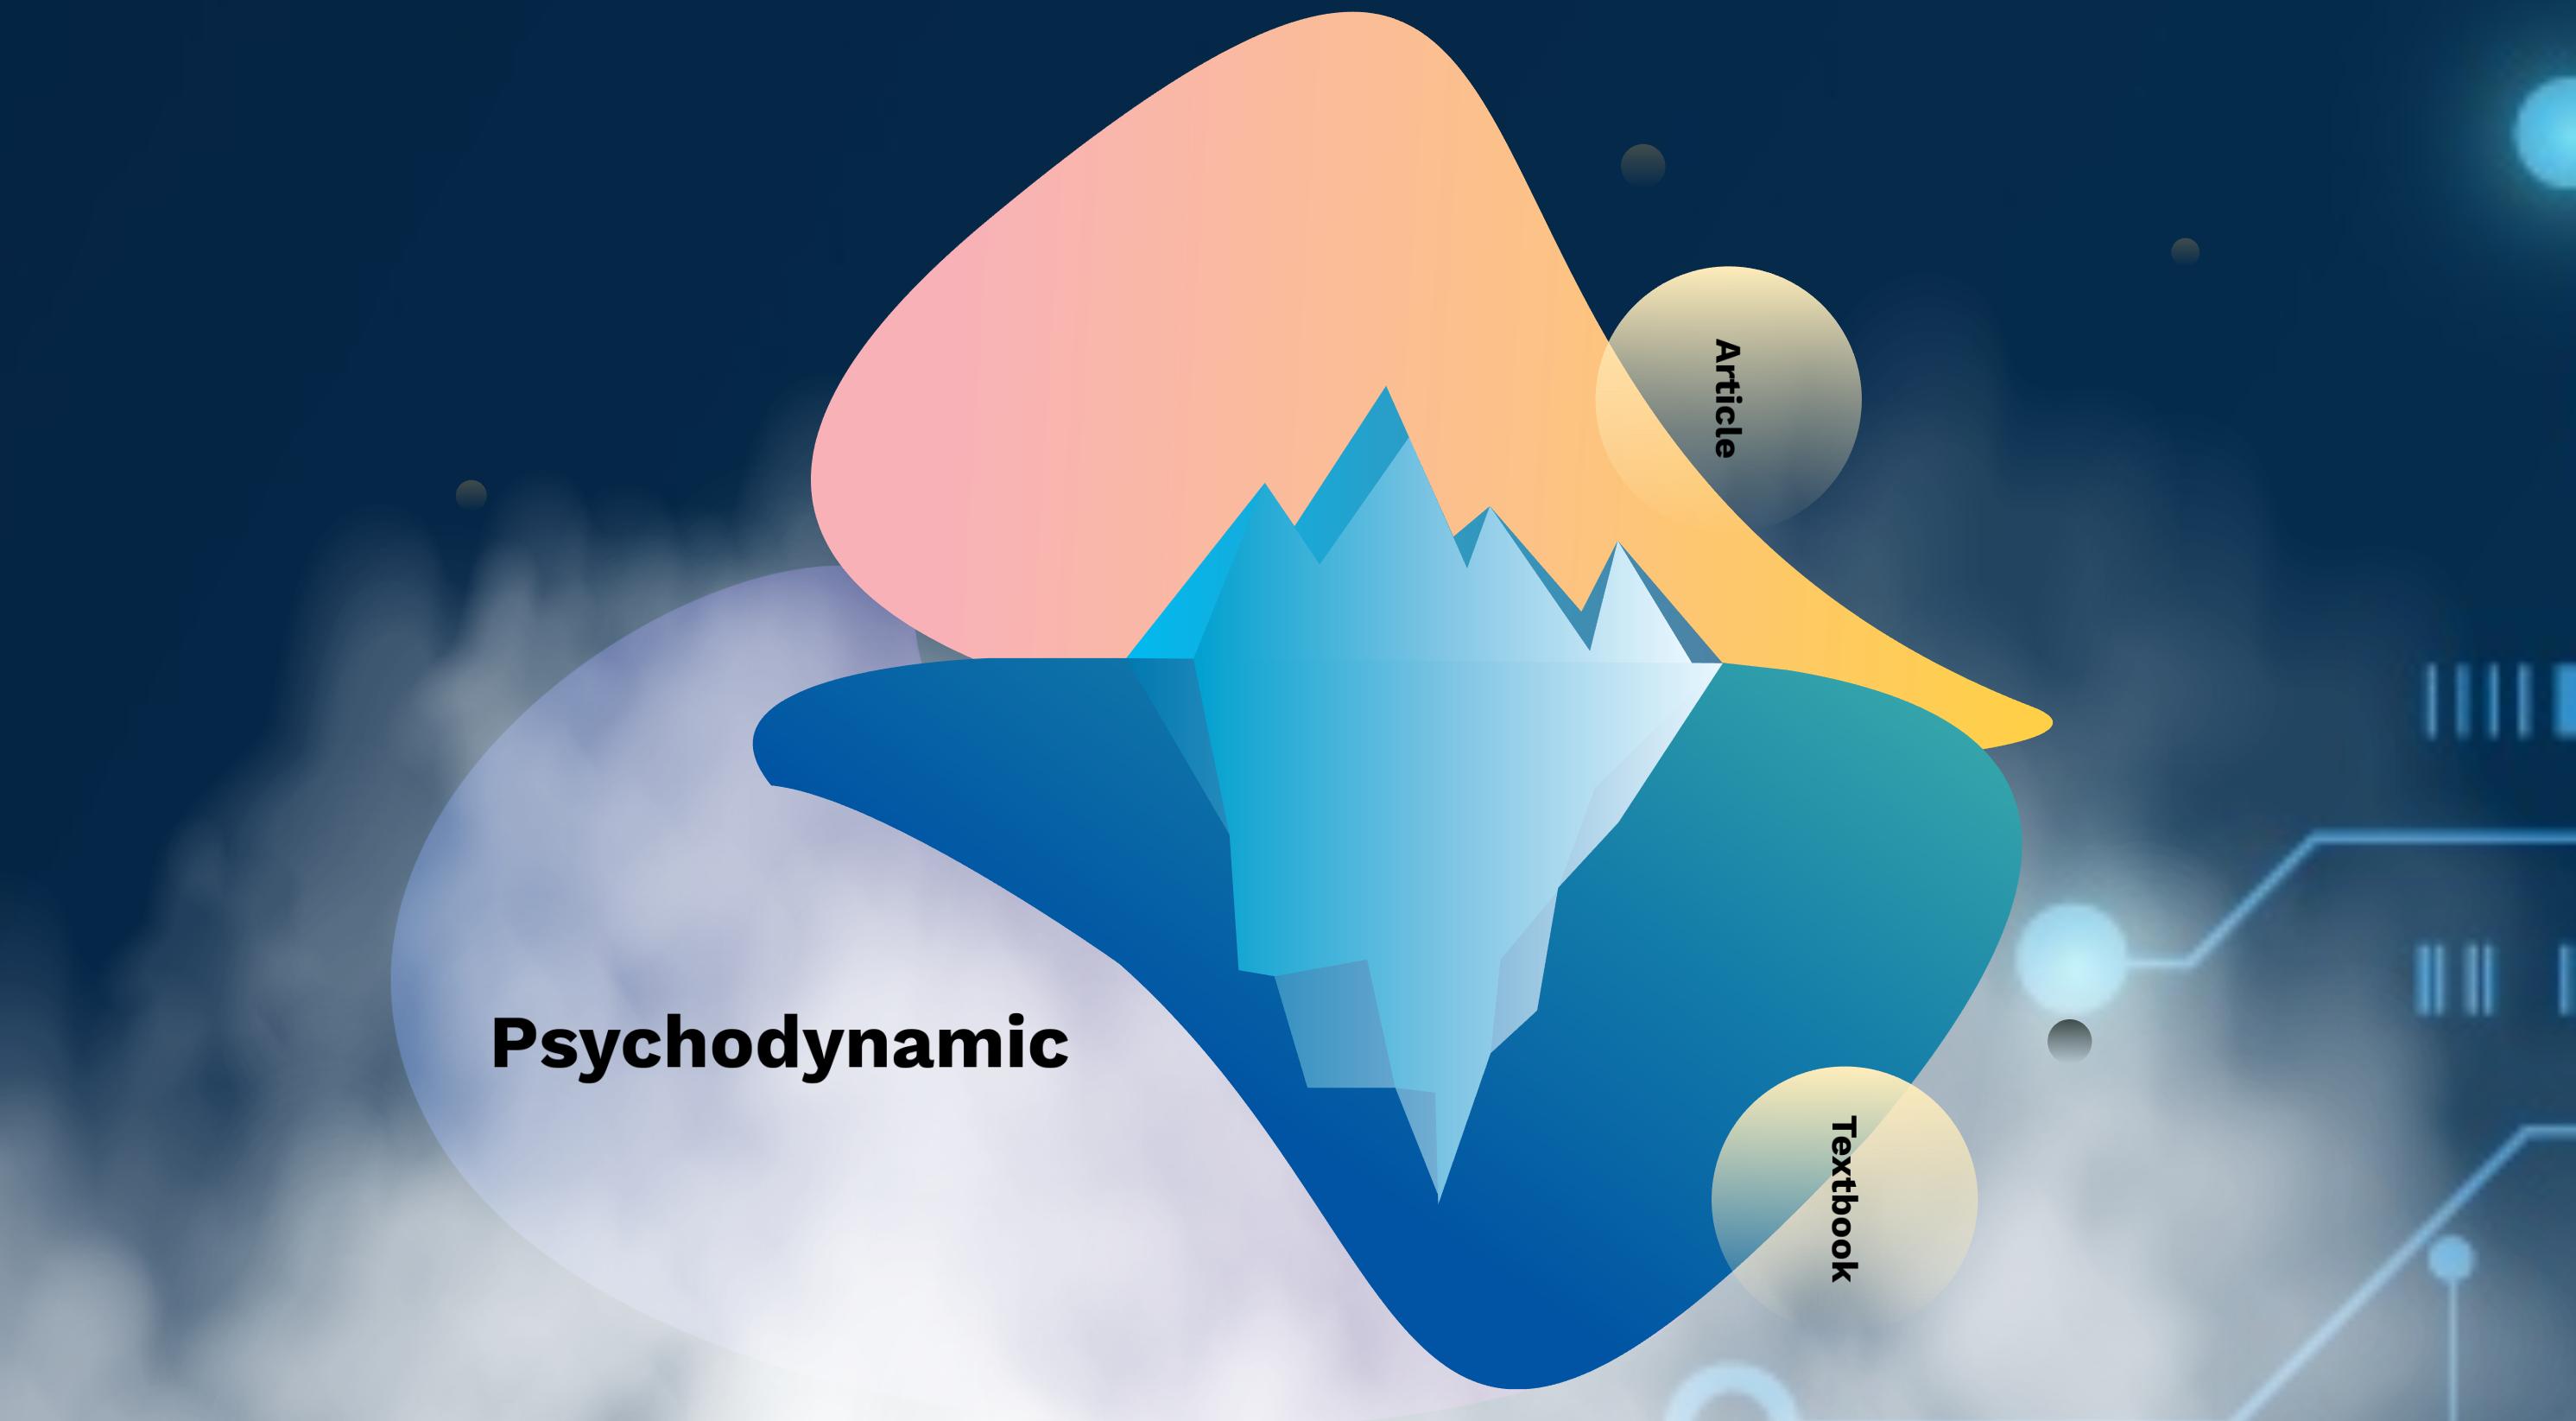 Psychodynamic Dreams Psychology Prezi Presentation for BCIT Psyc 1101 | Monika Szucs